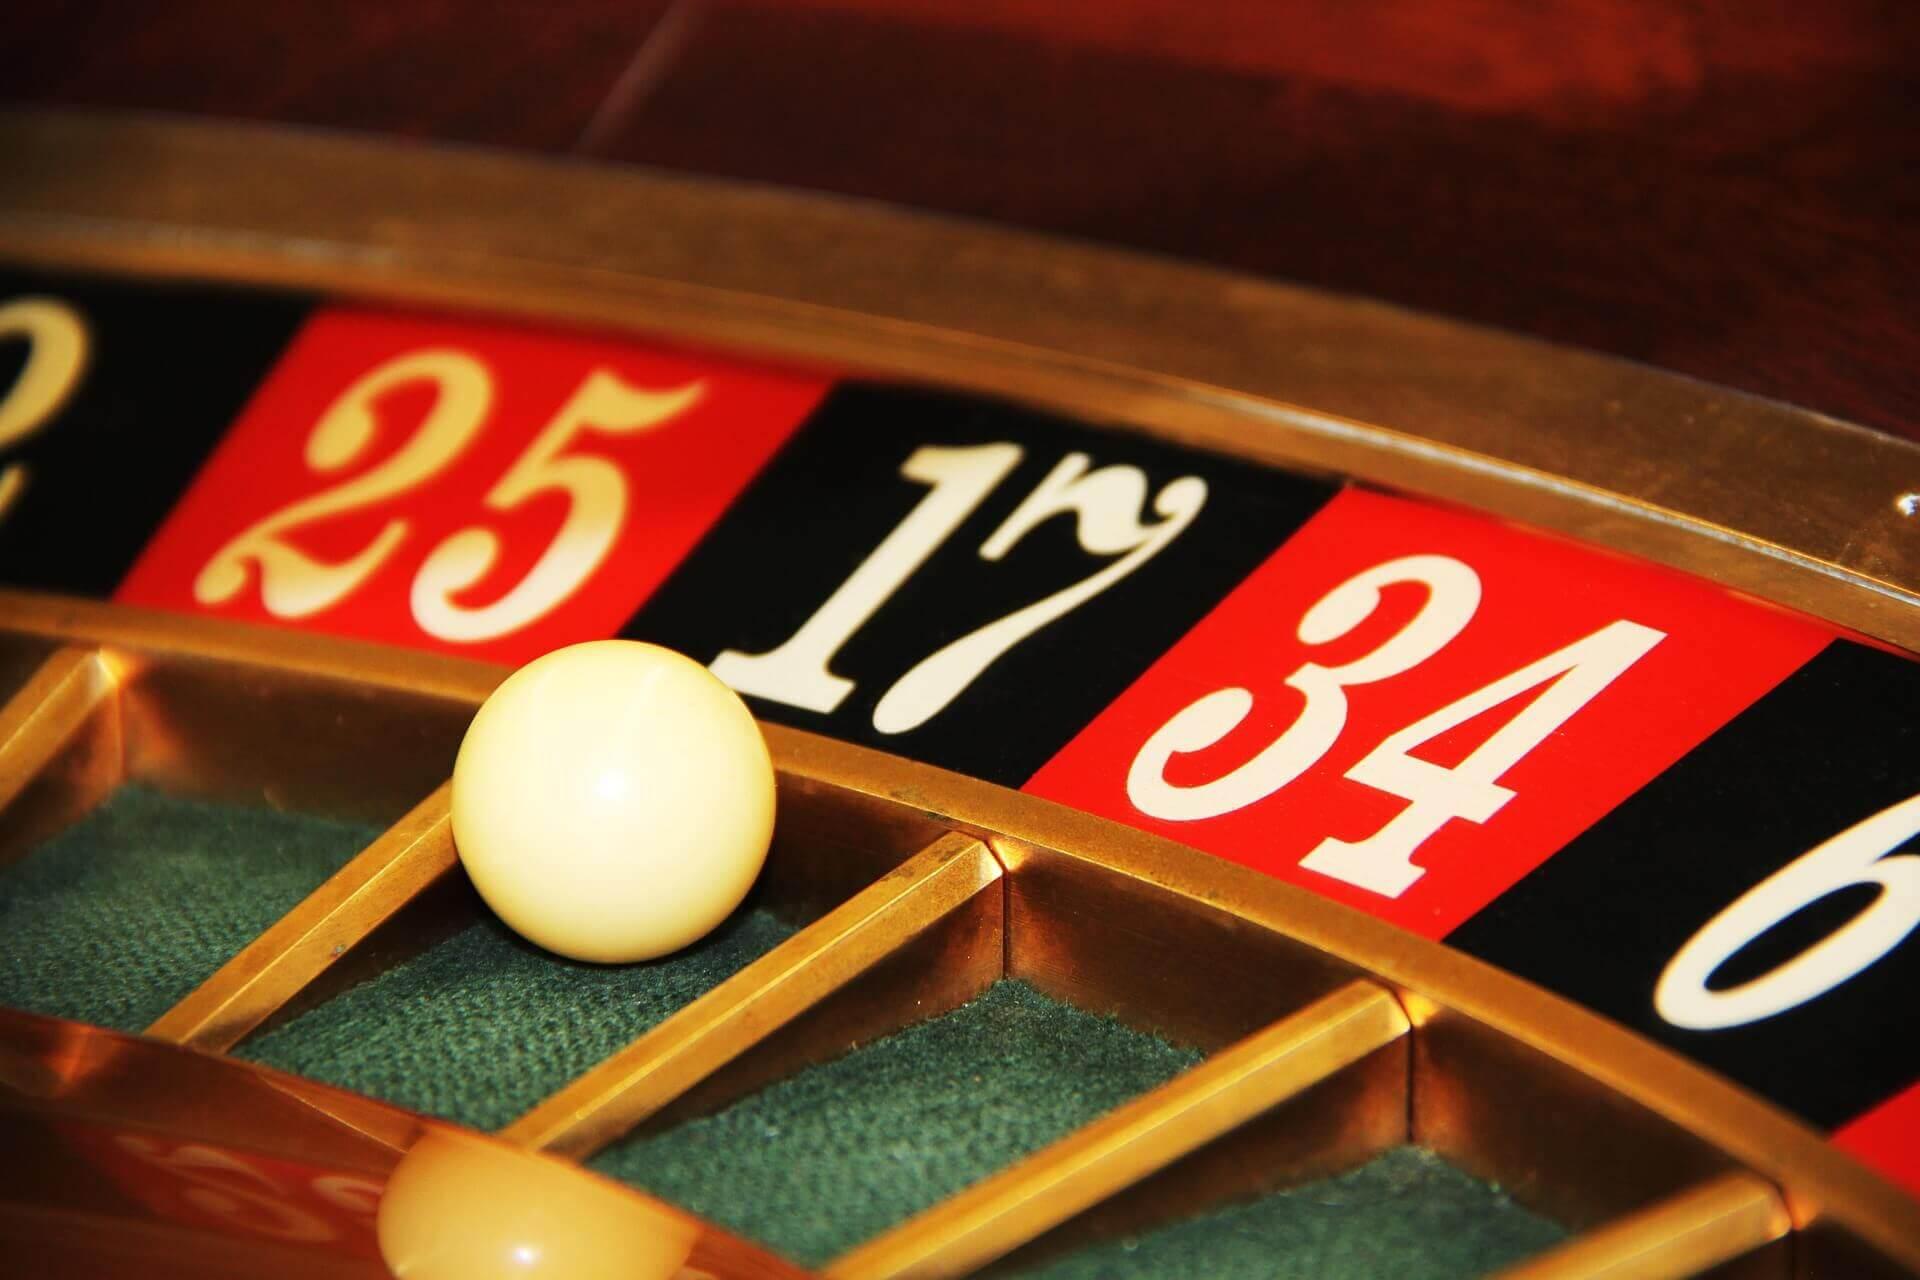 Rouletten snurrar - vem blir licensvinnare vid spelregleringen? Vilka har fått spellicenser!